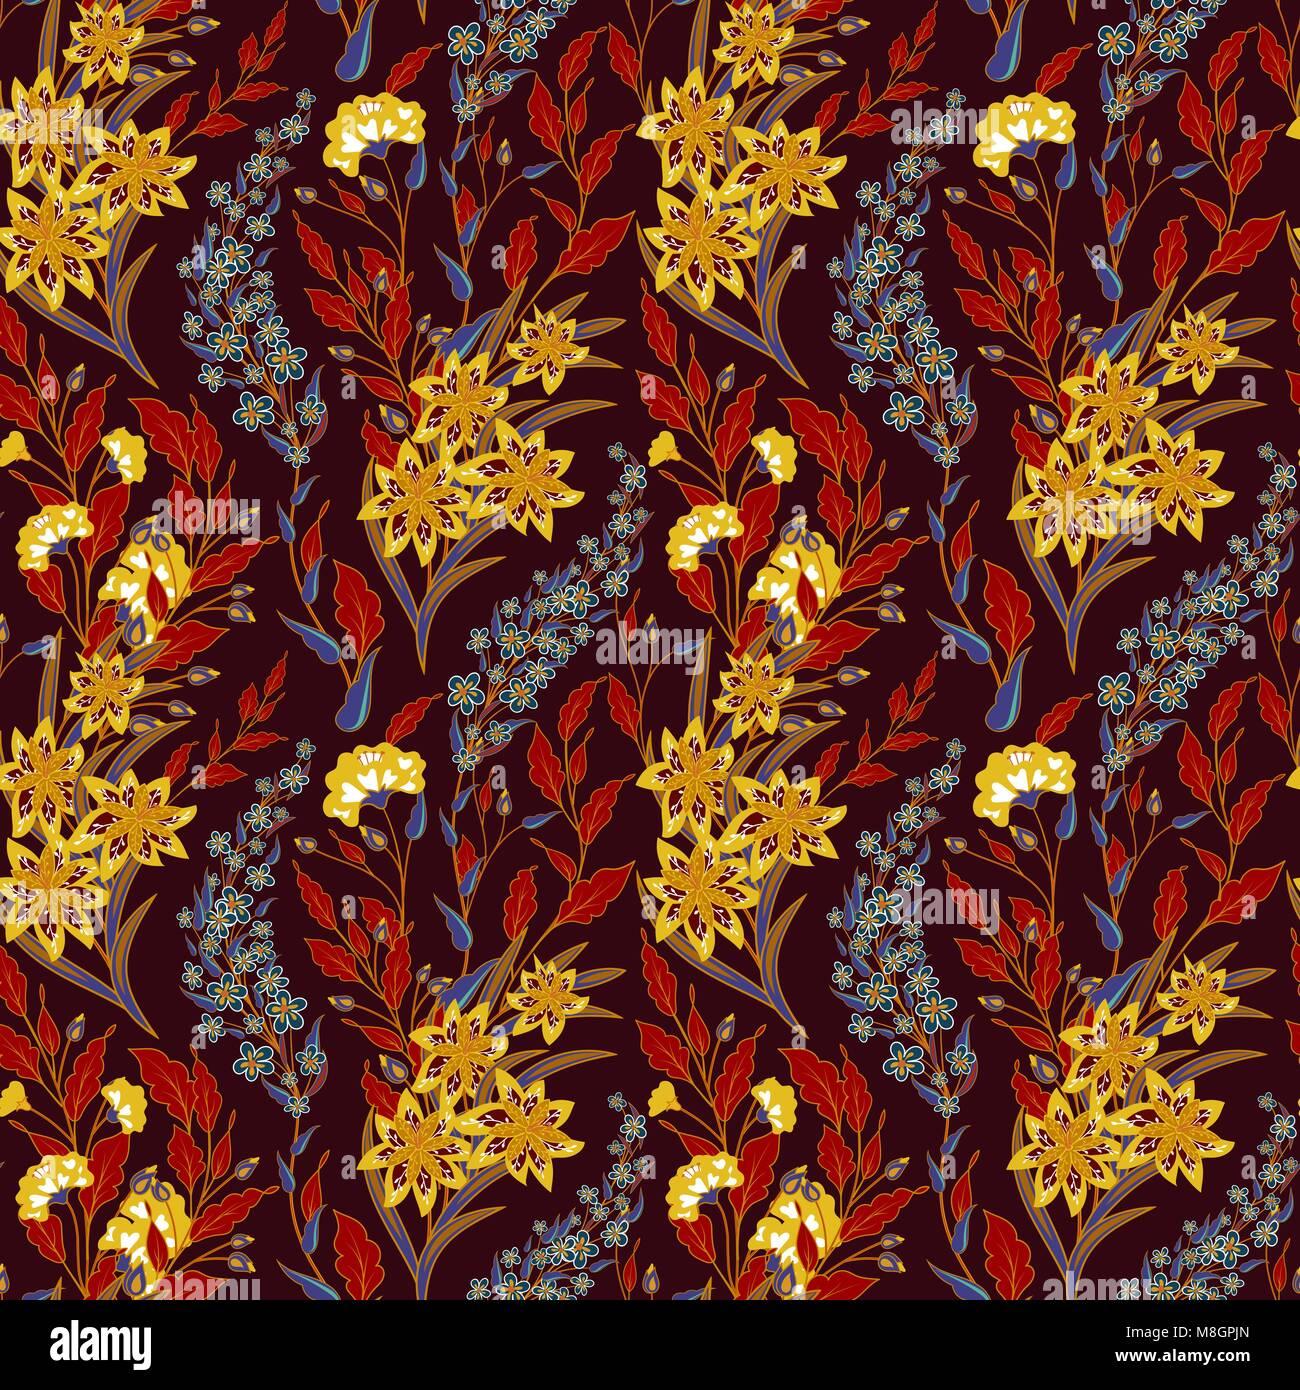 Vintage Seamless Floral Pattern On A Black Background Spring